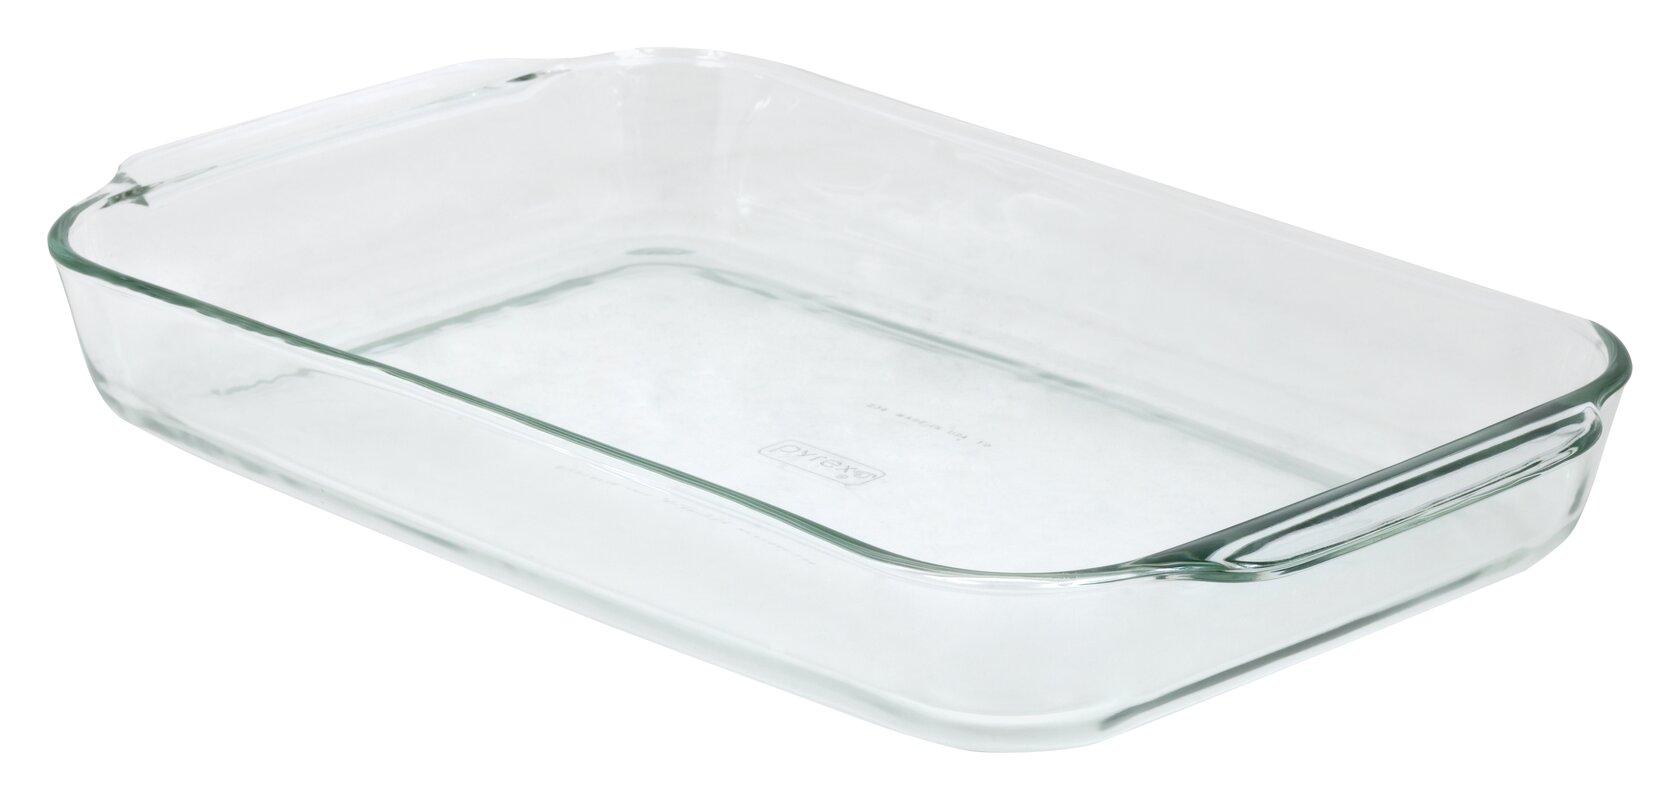 Pyrex Bakeware Rectangular Baking Dish amp Reviews Wayfair